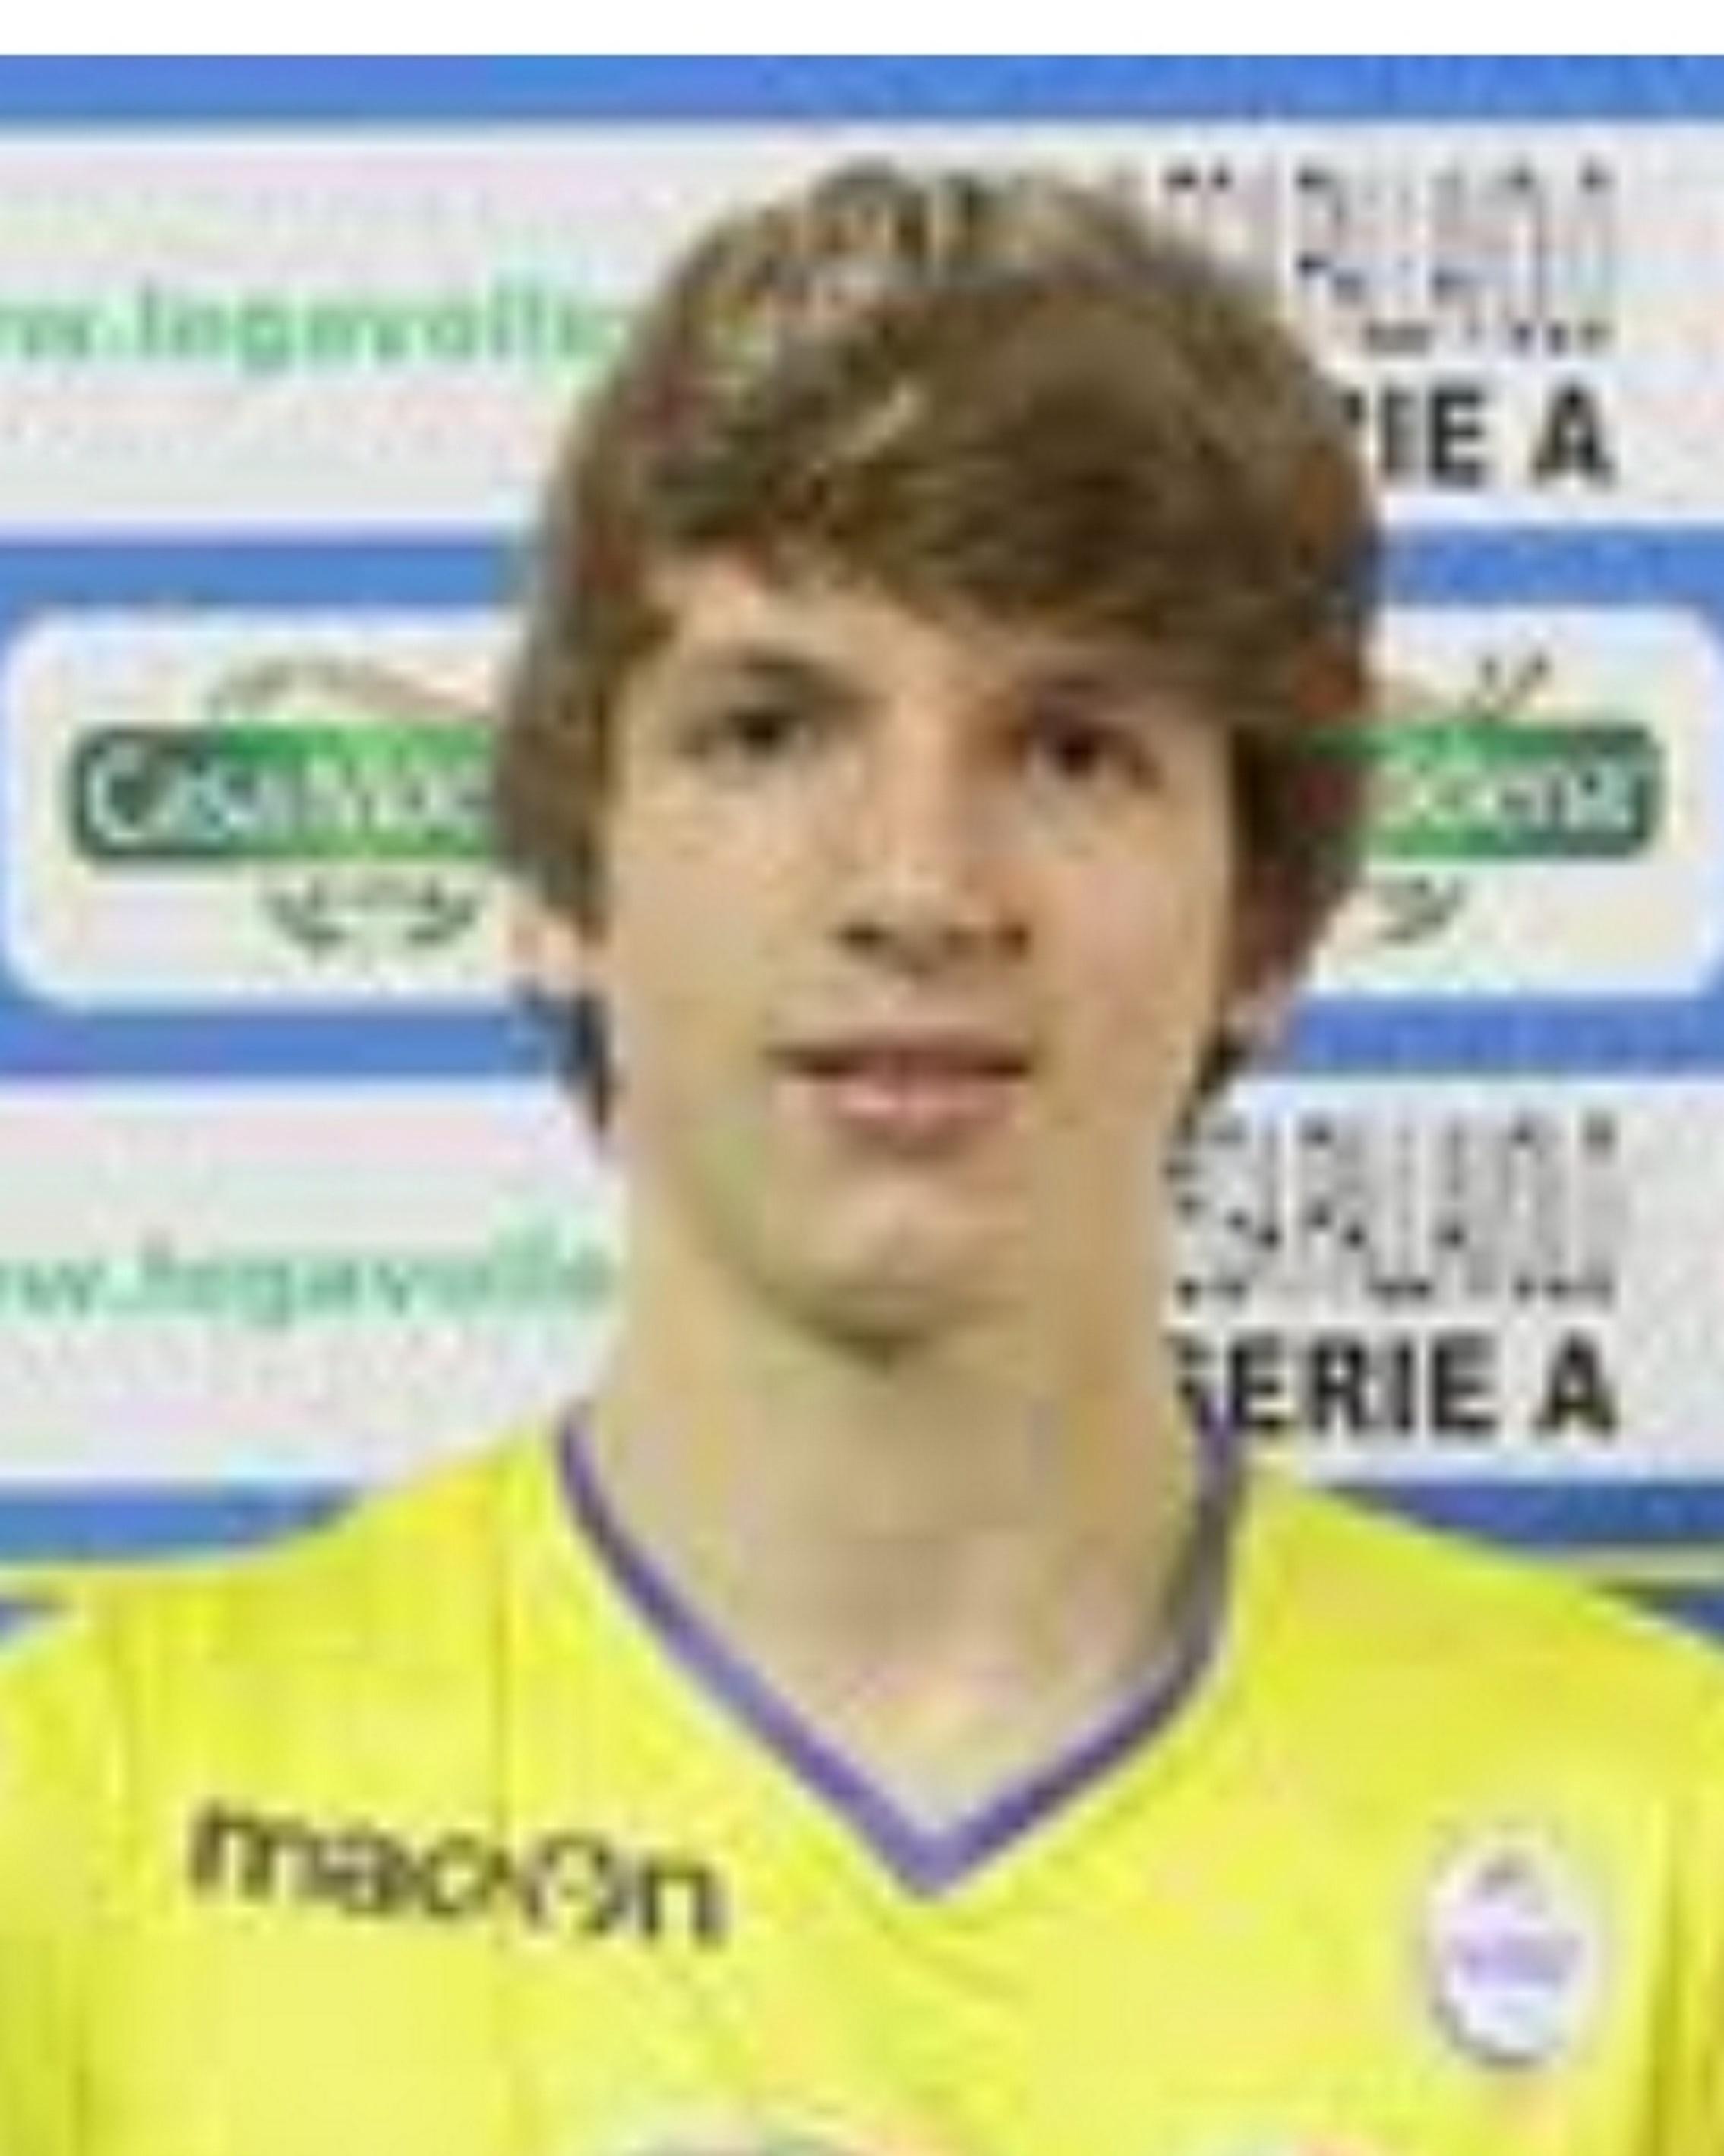 Elia Bossi